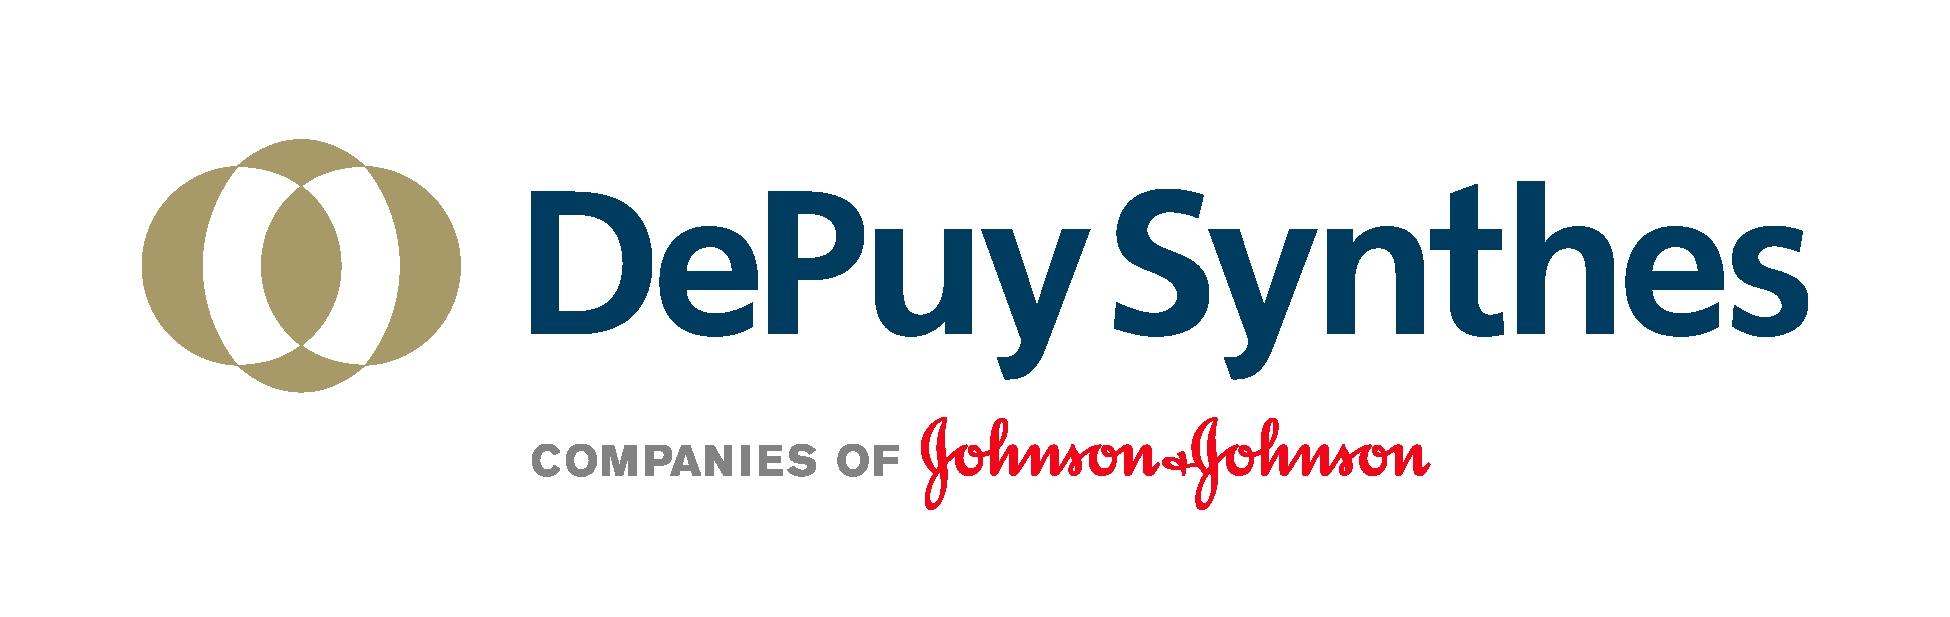 DePuy Synthes Companies of Johnson & Johnson logo